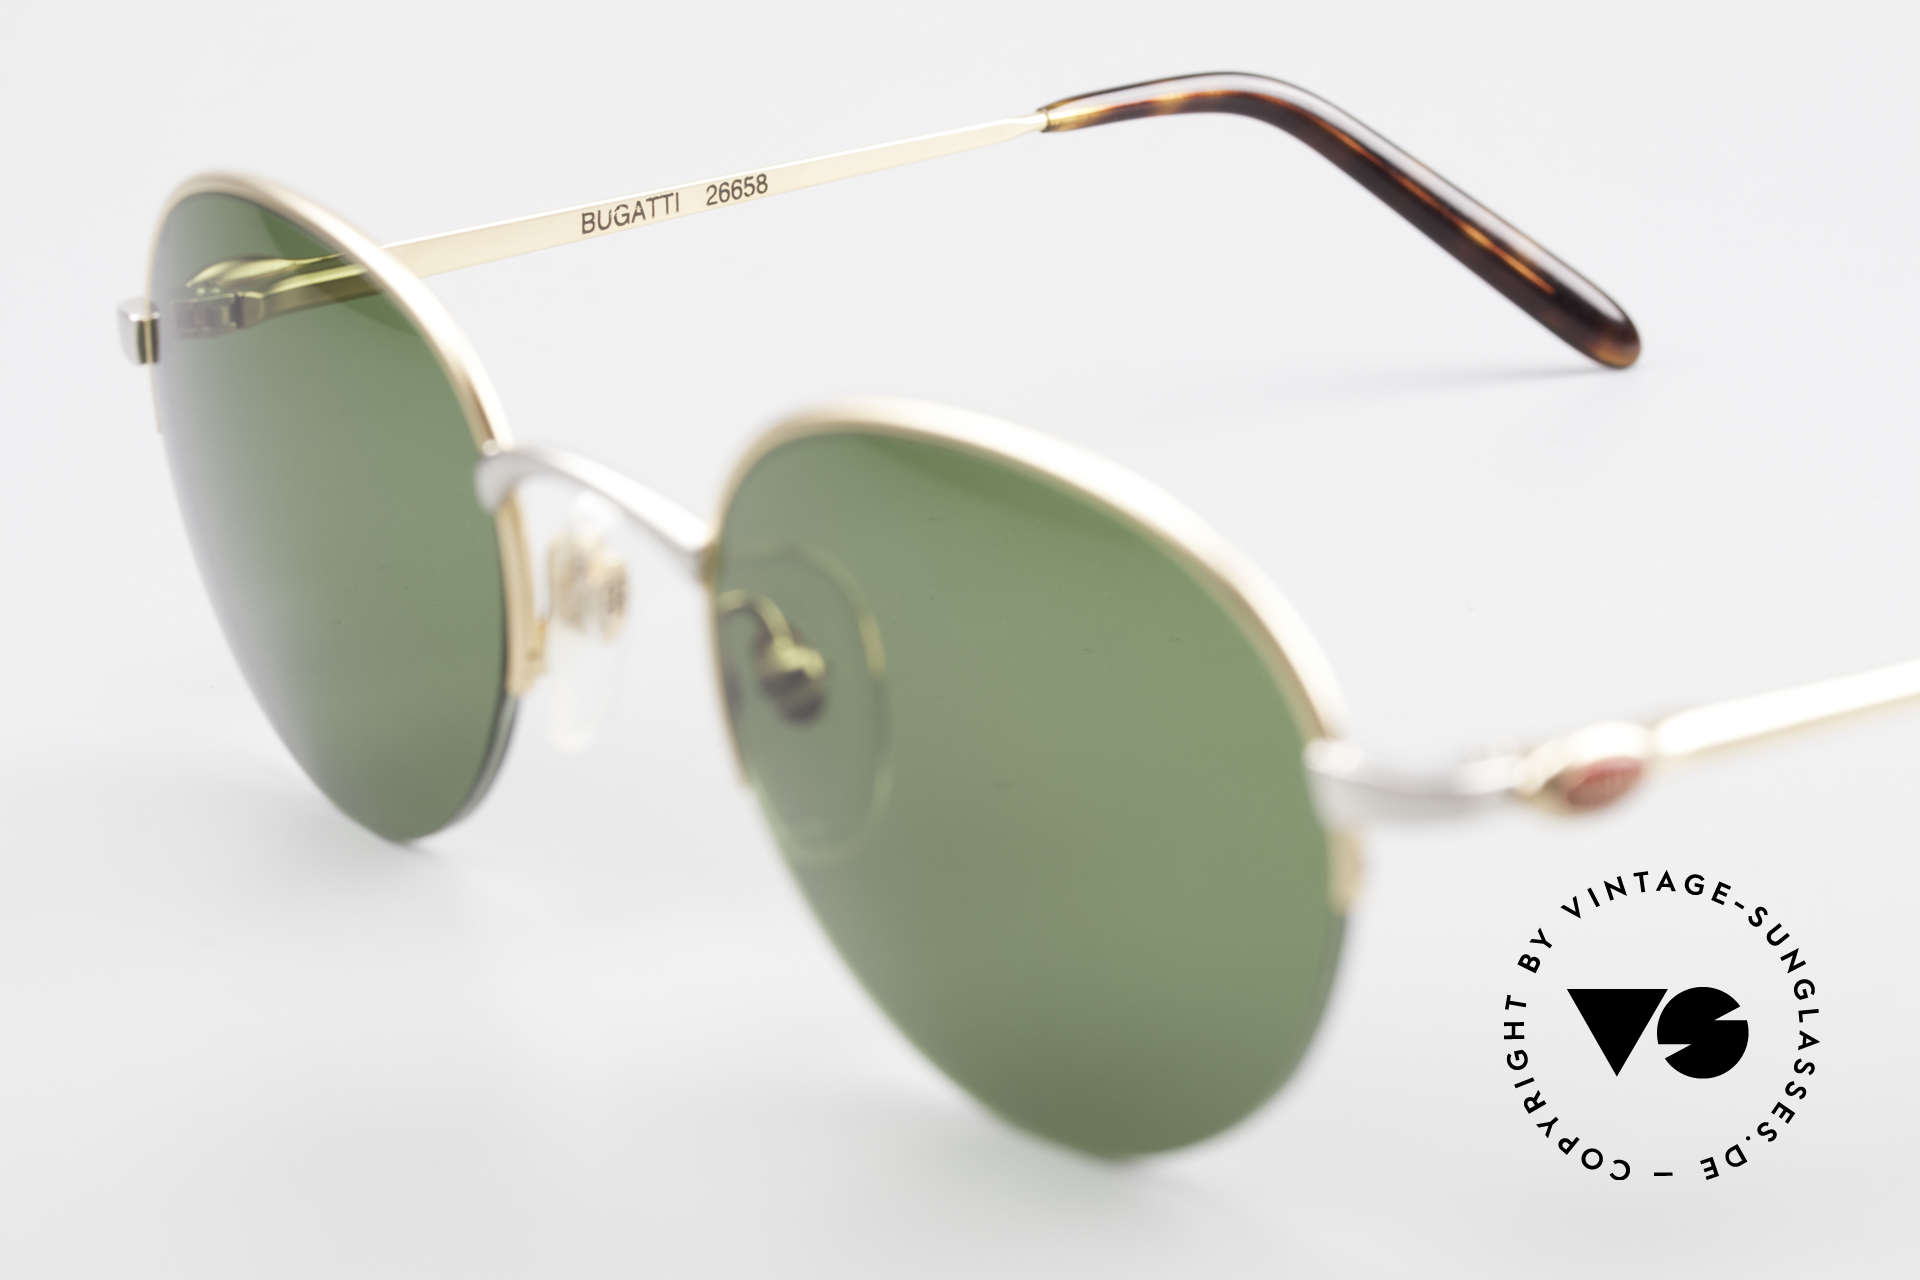 Bugatti 26658 Rare Panto Designer Shades, green sun lenses can be replaced with optical lenses, Made for Men